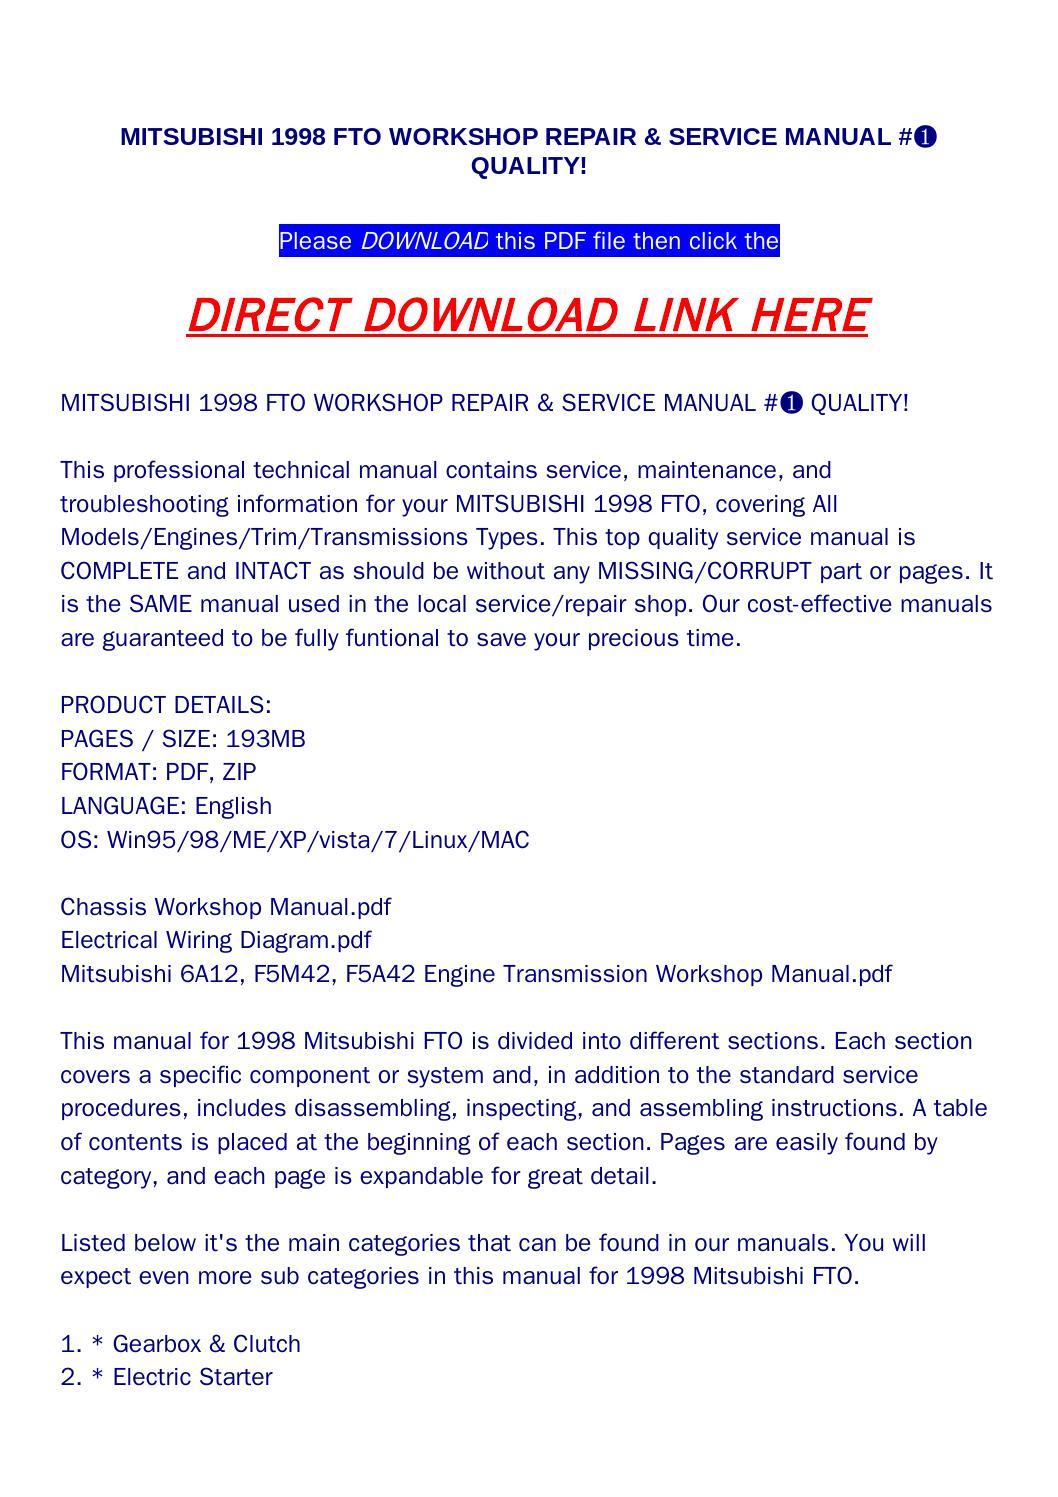 Mitsubishi 1998 fto workshop repair & service manual #➀ quality! by  bonus300 - issuu